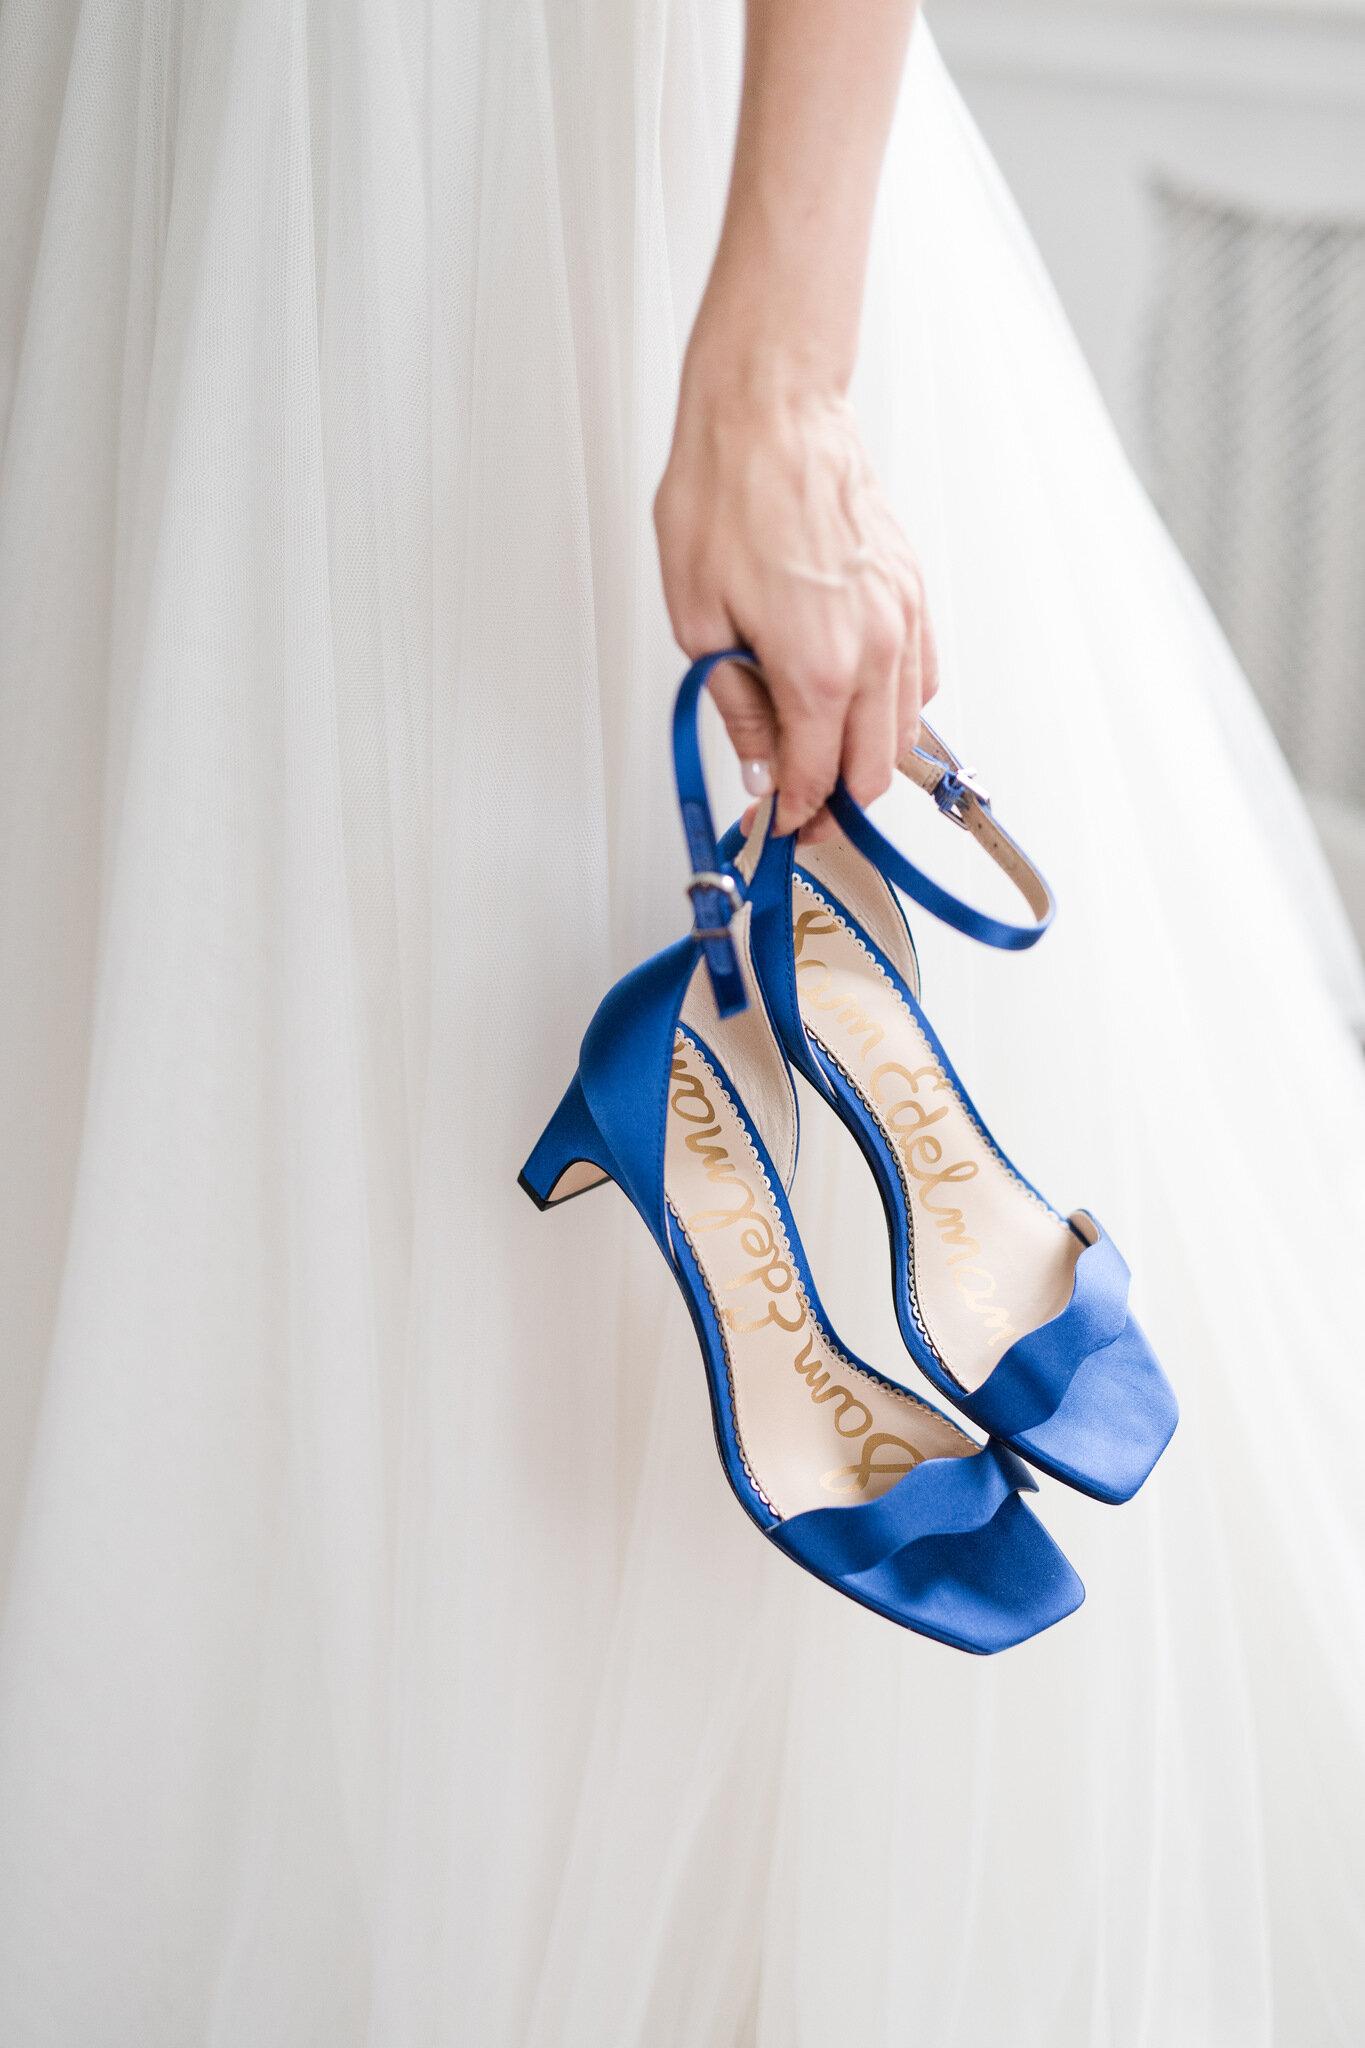 greenwich wedding_belle haven club wedding _ct wedding photographer-14_Easy-Resize.com.jpg